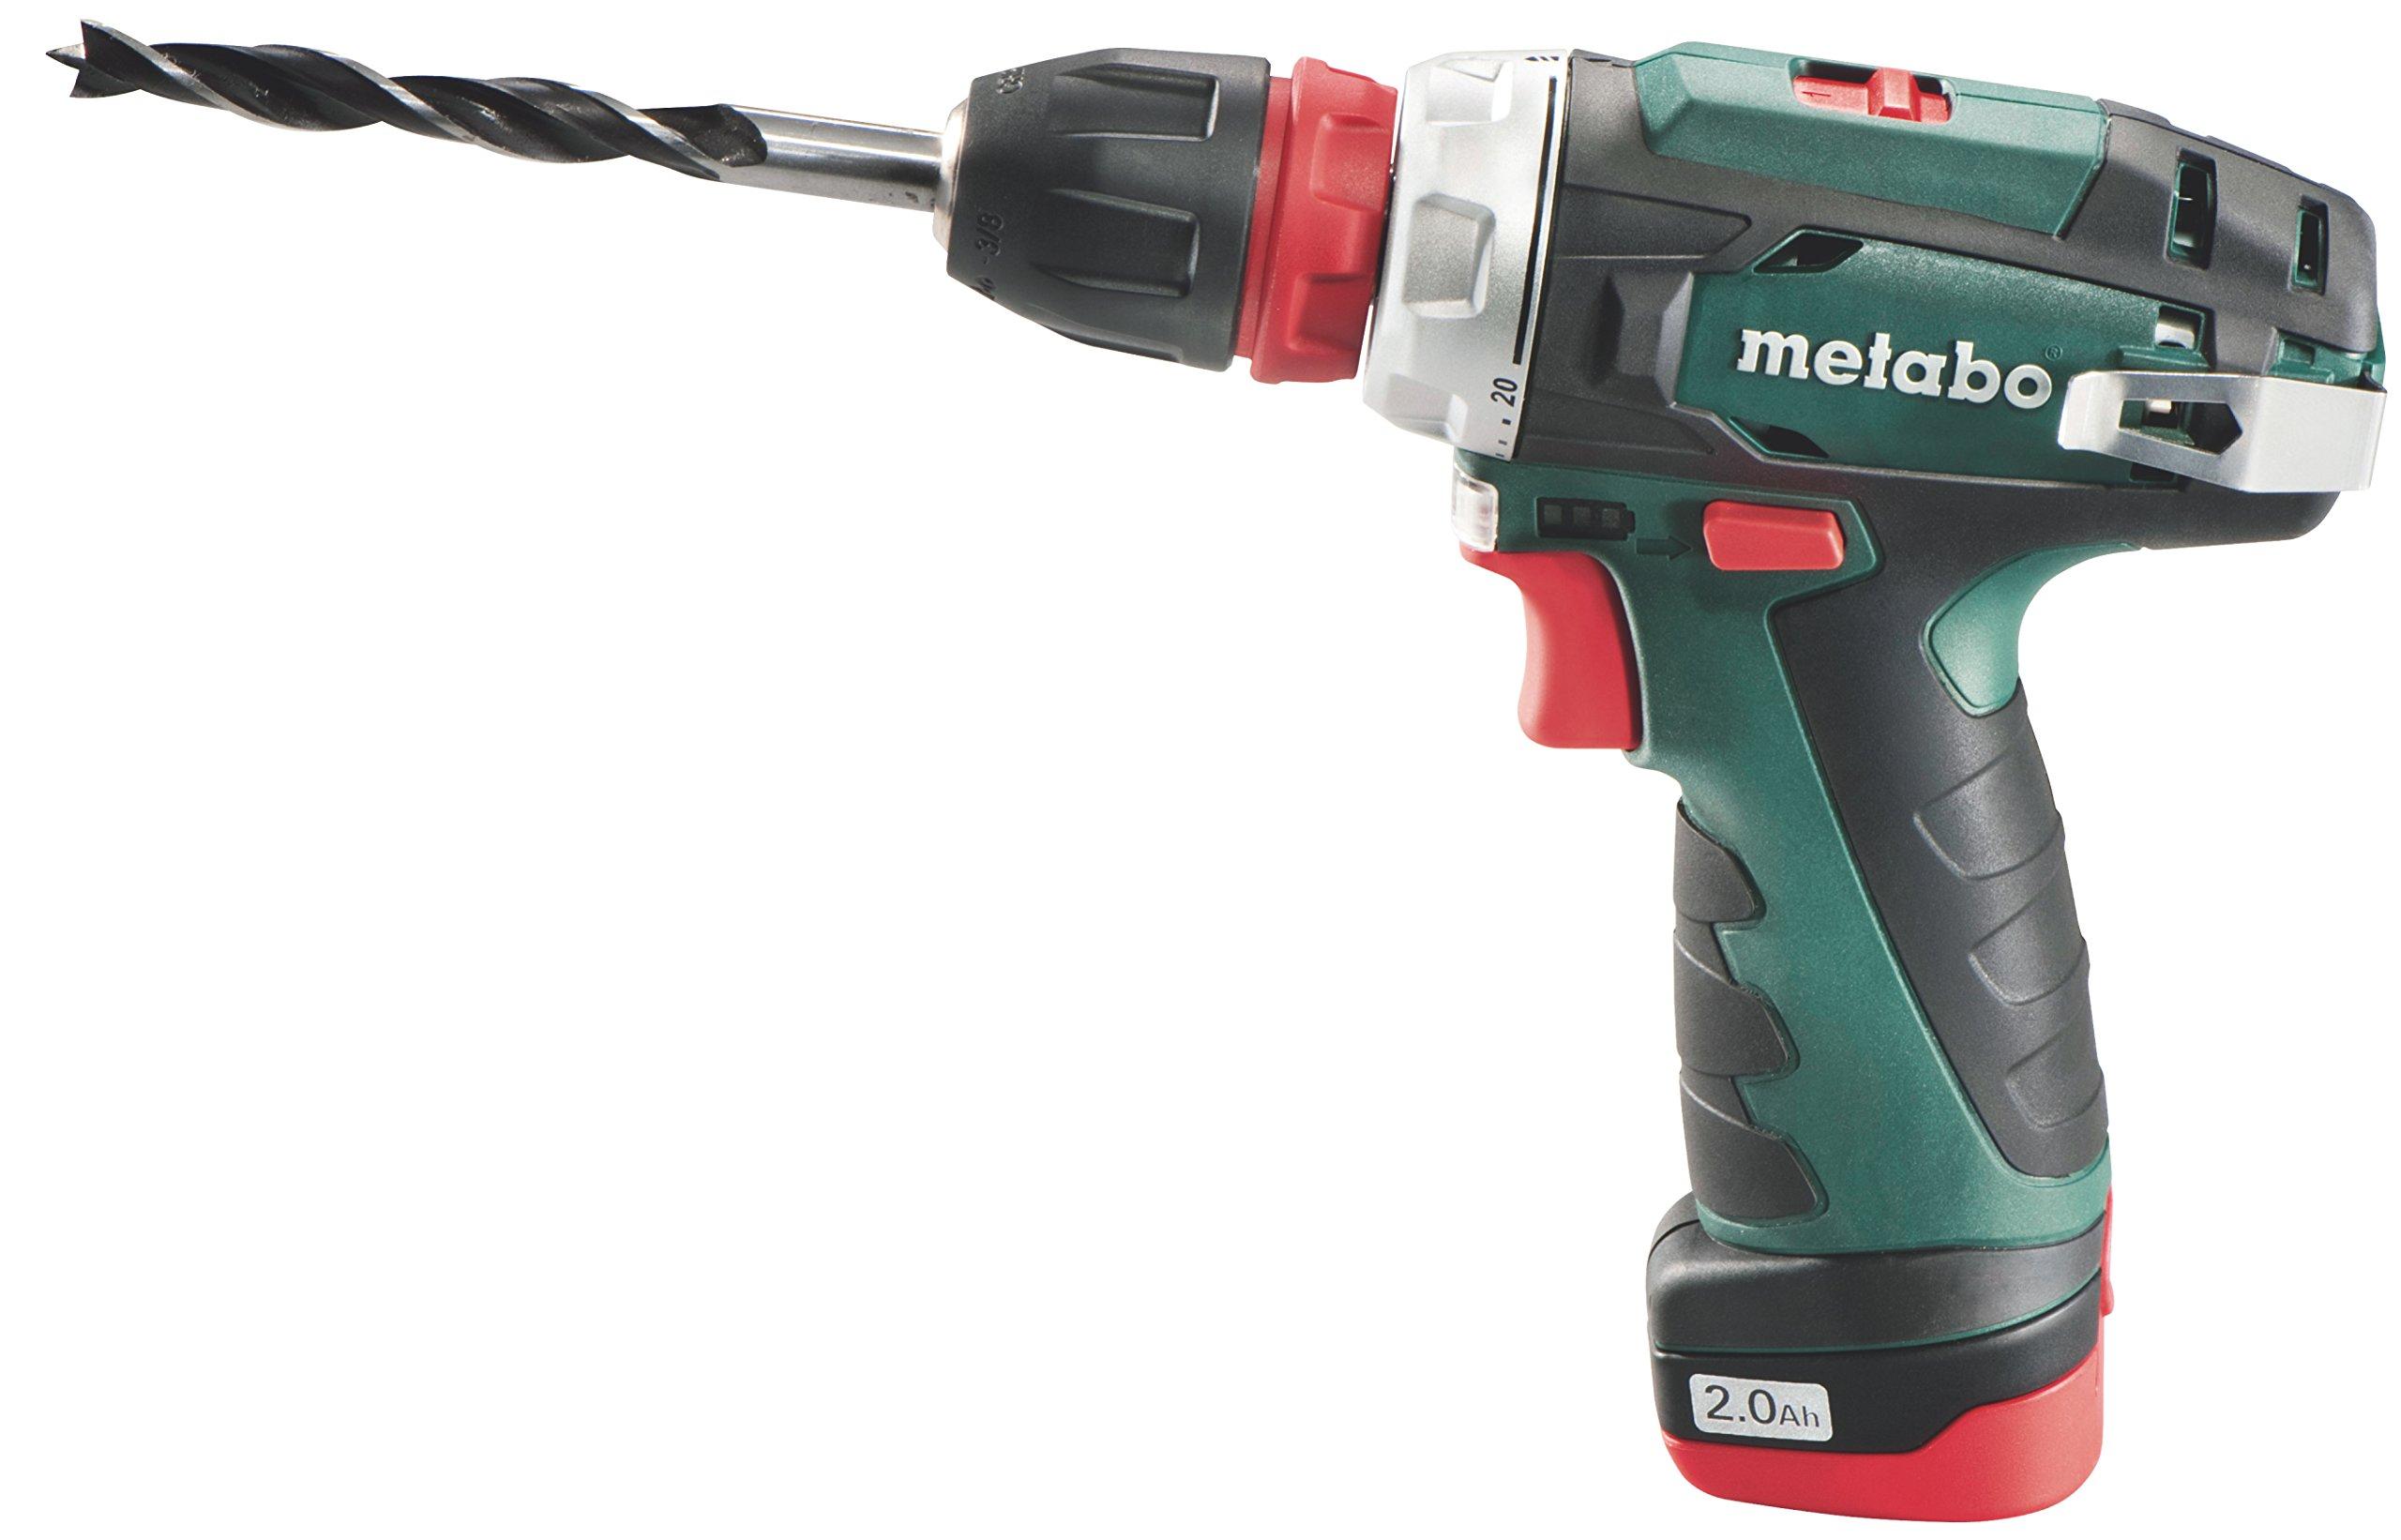 Metabo-600156500-PowerMaxx-BS-Quick-Basic-Akku-Bohrschrauber-108-V-Grn-Rot